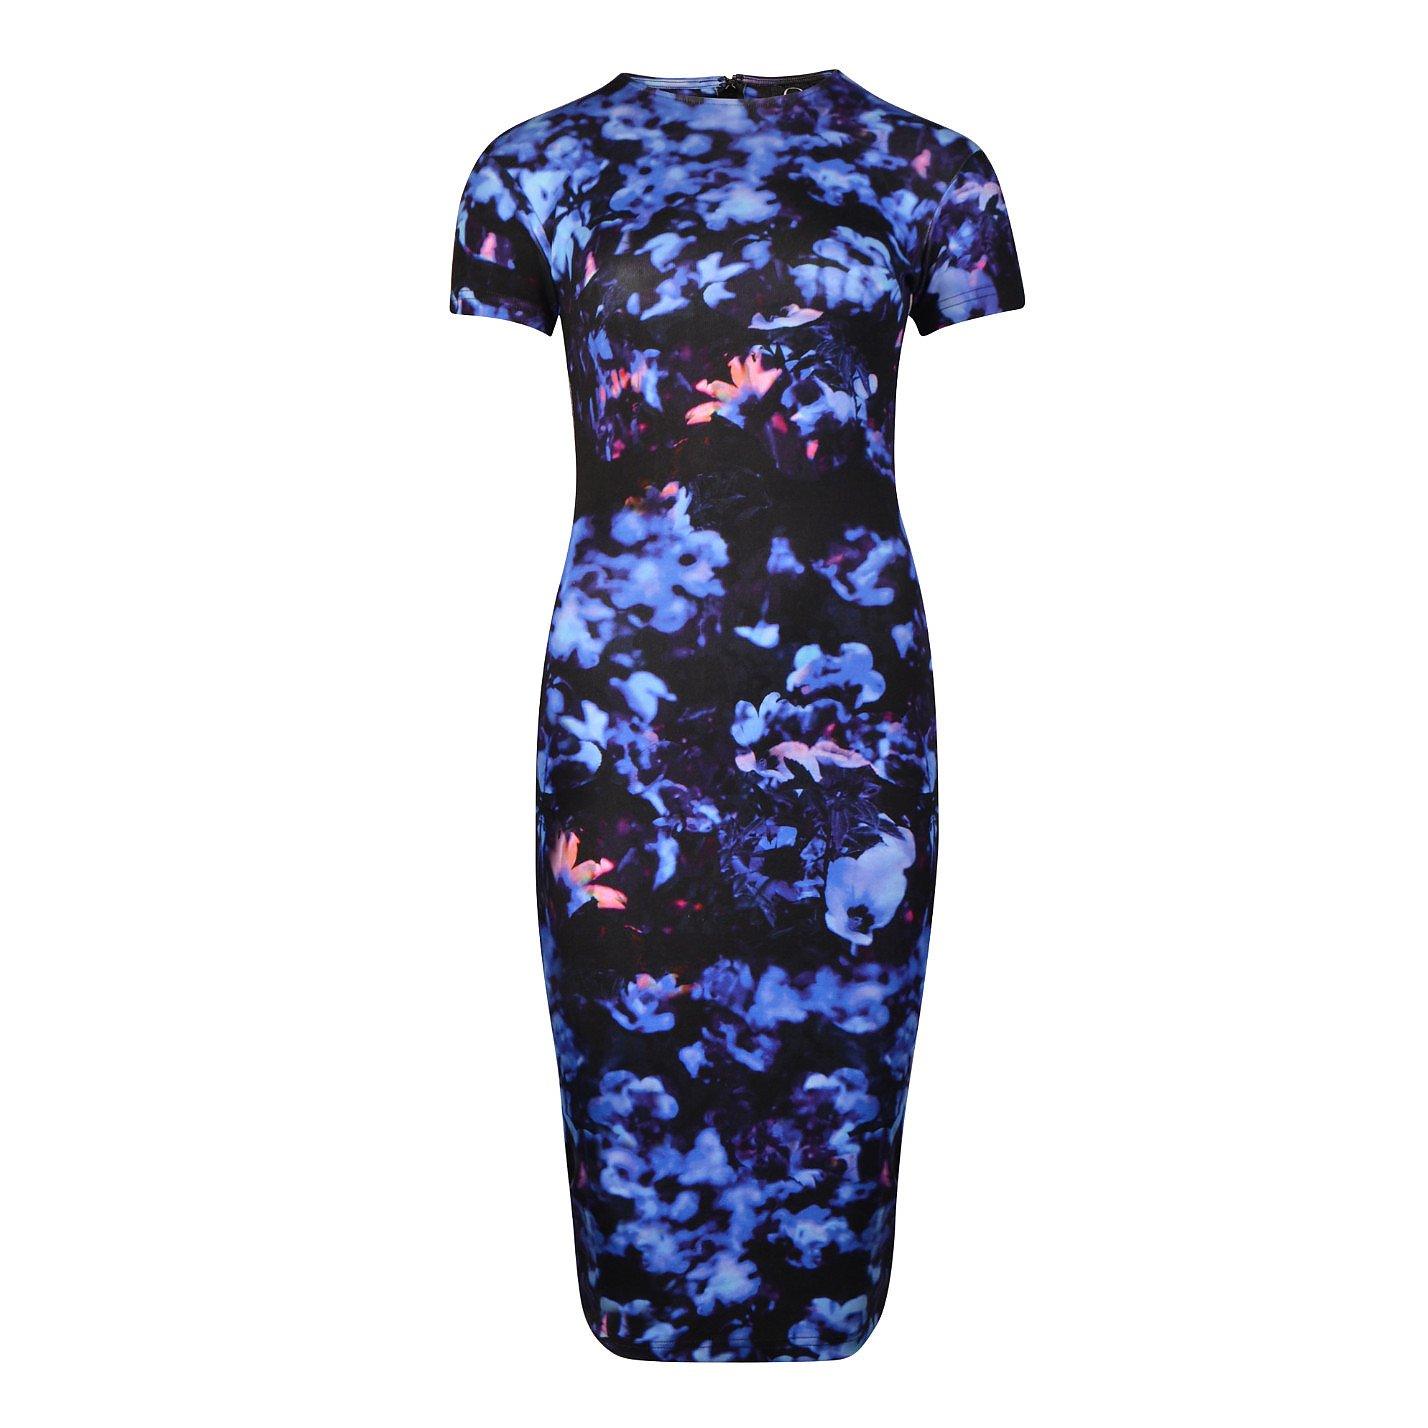 McQ Floral Print Body-Con Dress